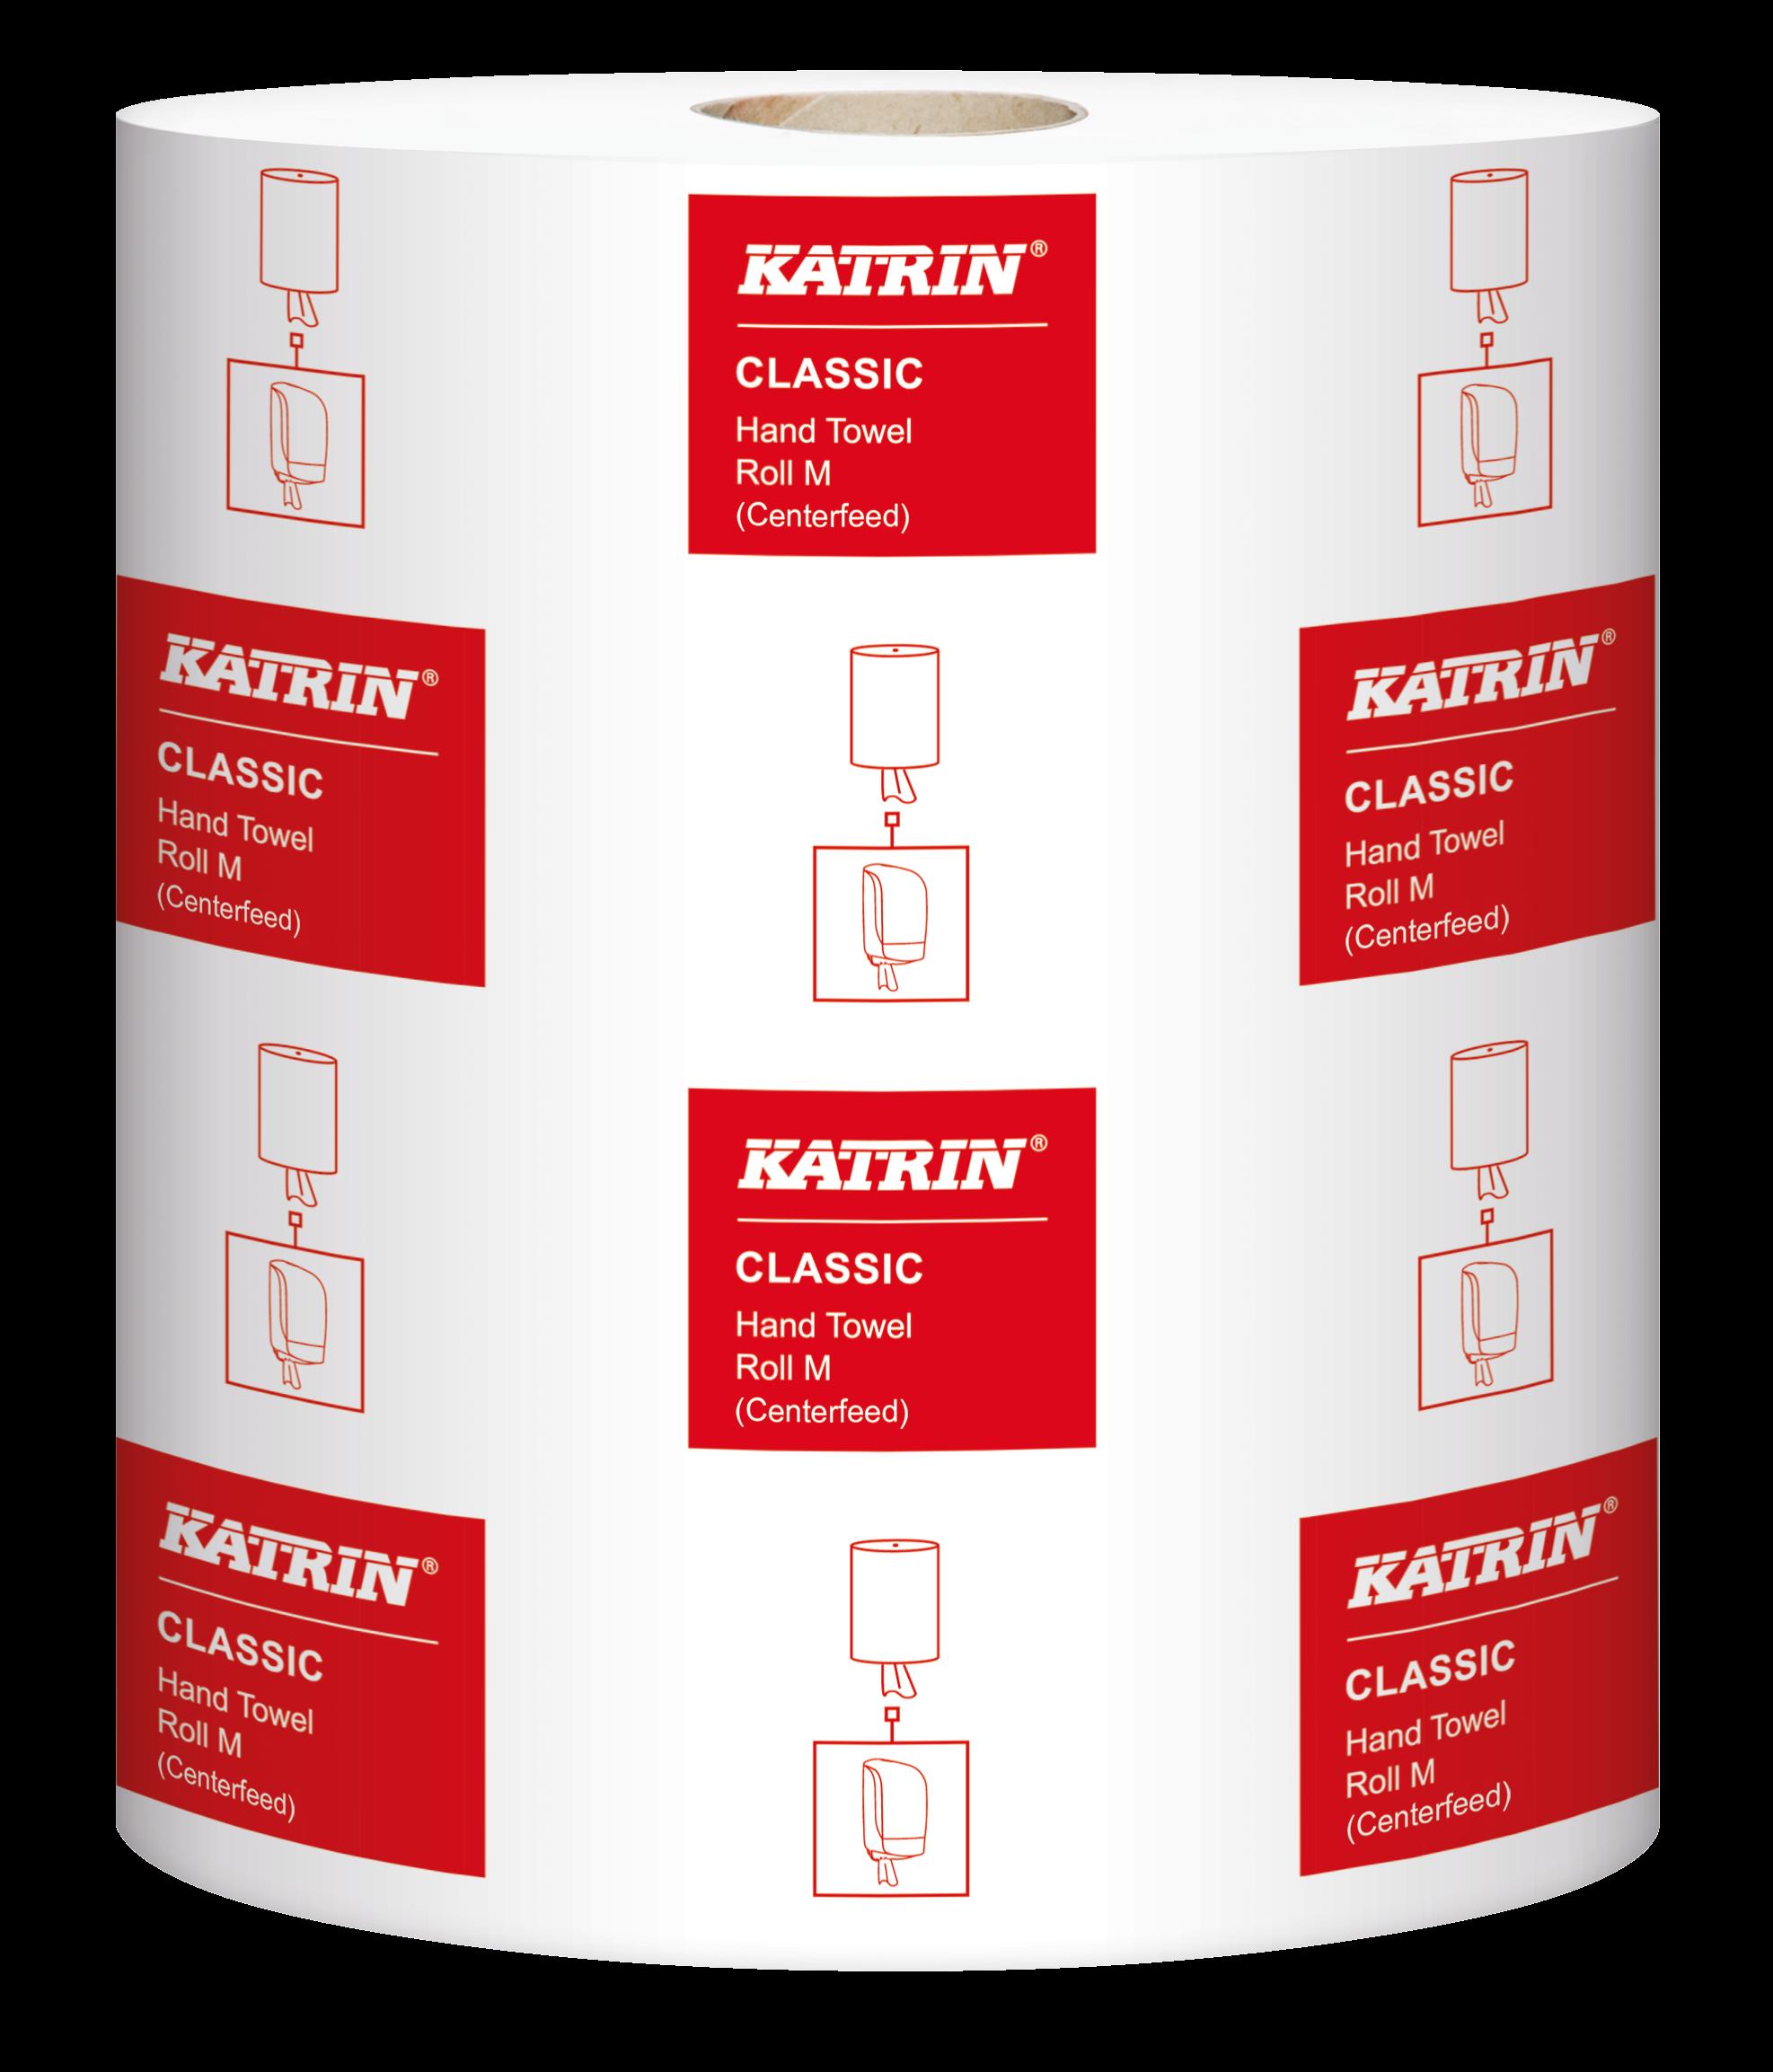 Katrin Classic Hand Towel Roll M 2